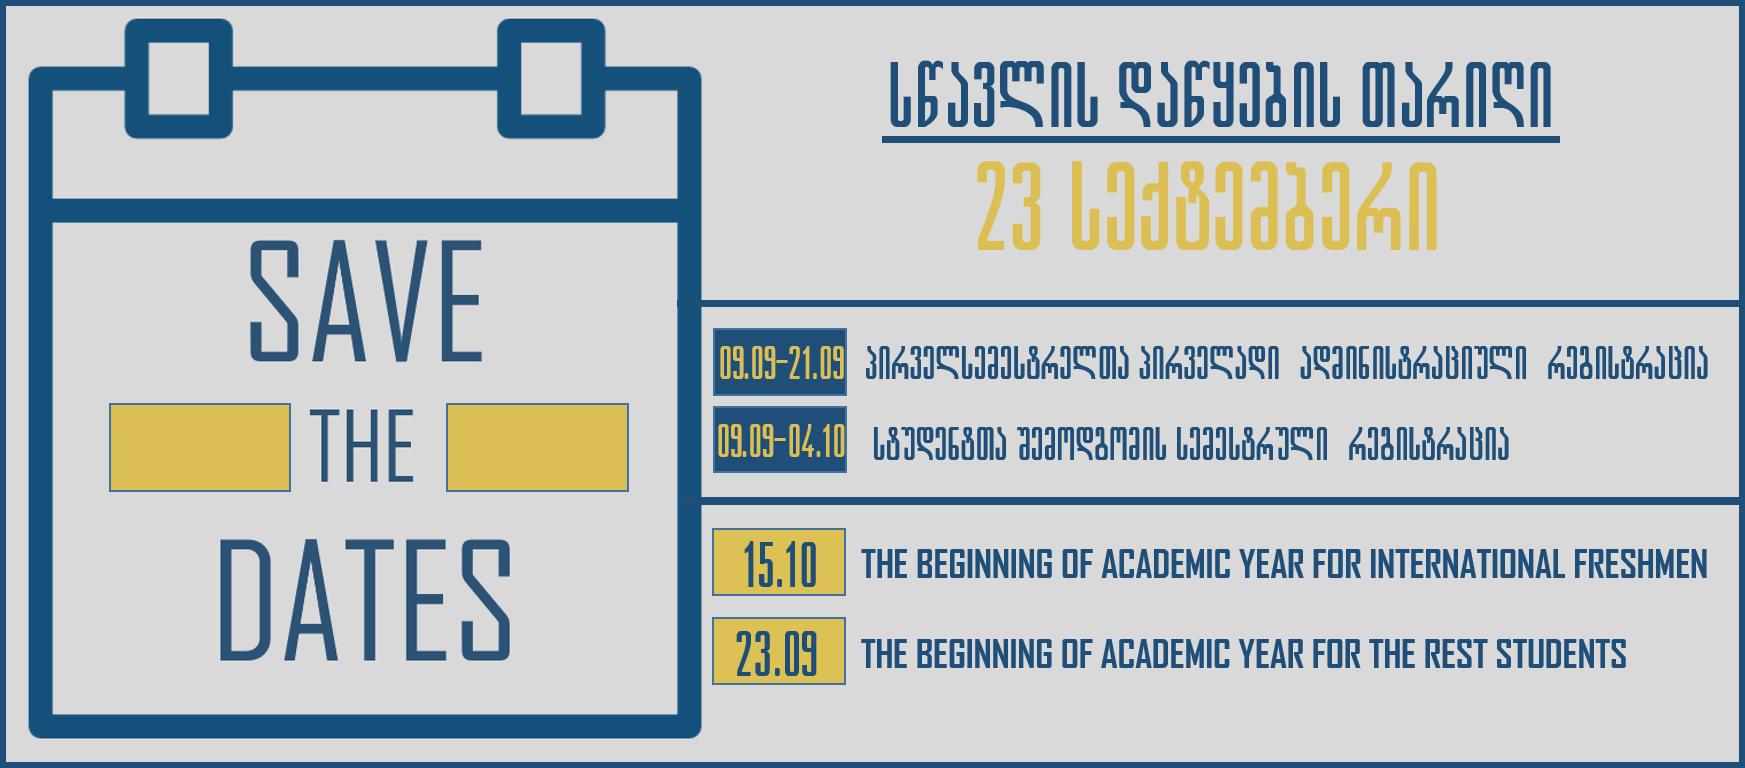 2019 2020 Academic Calendar For International Students Pertaining To Uri Calendar Academic